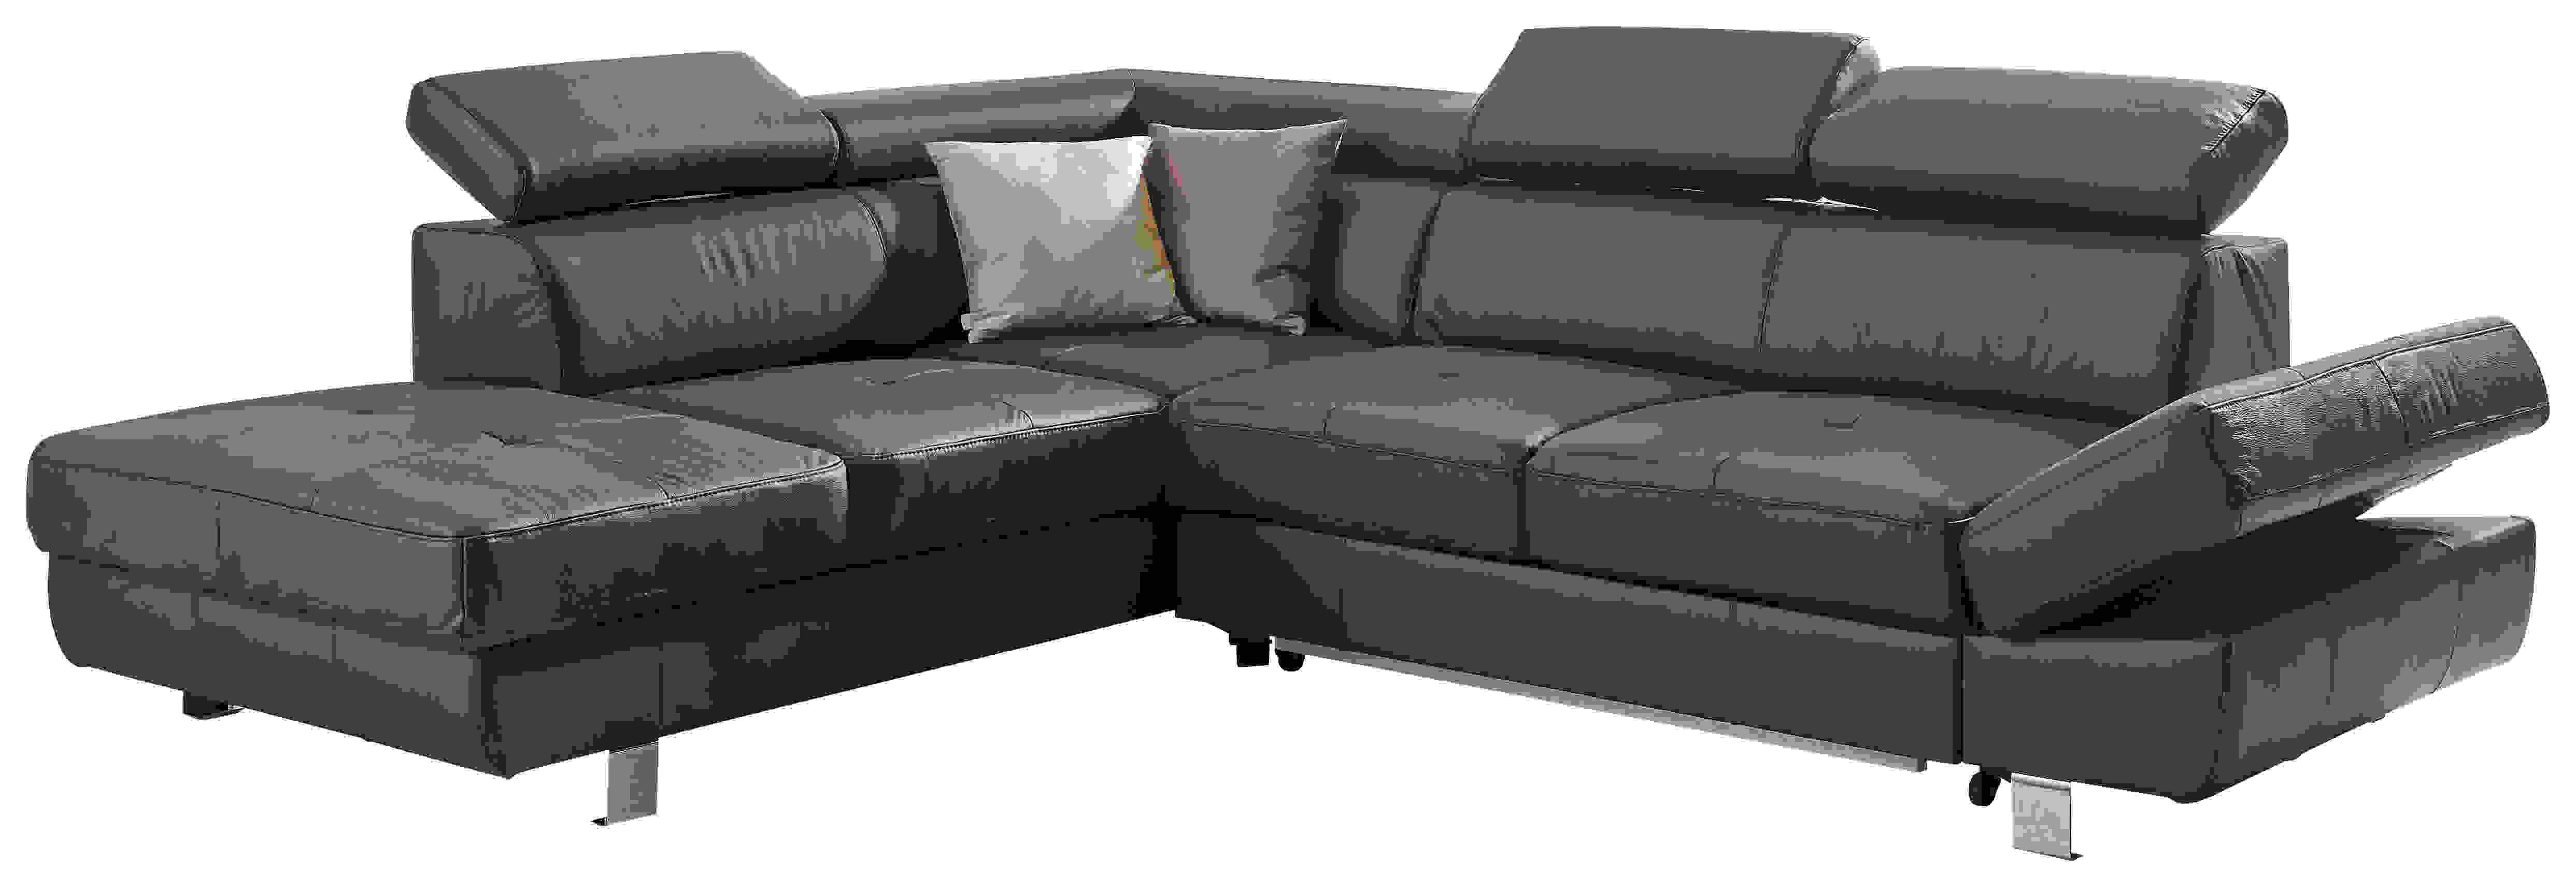 MITENG Inkjet-/Ölgem/älde Mode Blume Oder Schlafzimmerlandschaft des Hd-Kunst/ölgem/älde-Plakats Modernes Ohne Rahmen XL des Sofa-Wandhintergrundausgangswohnzimmer